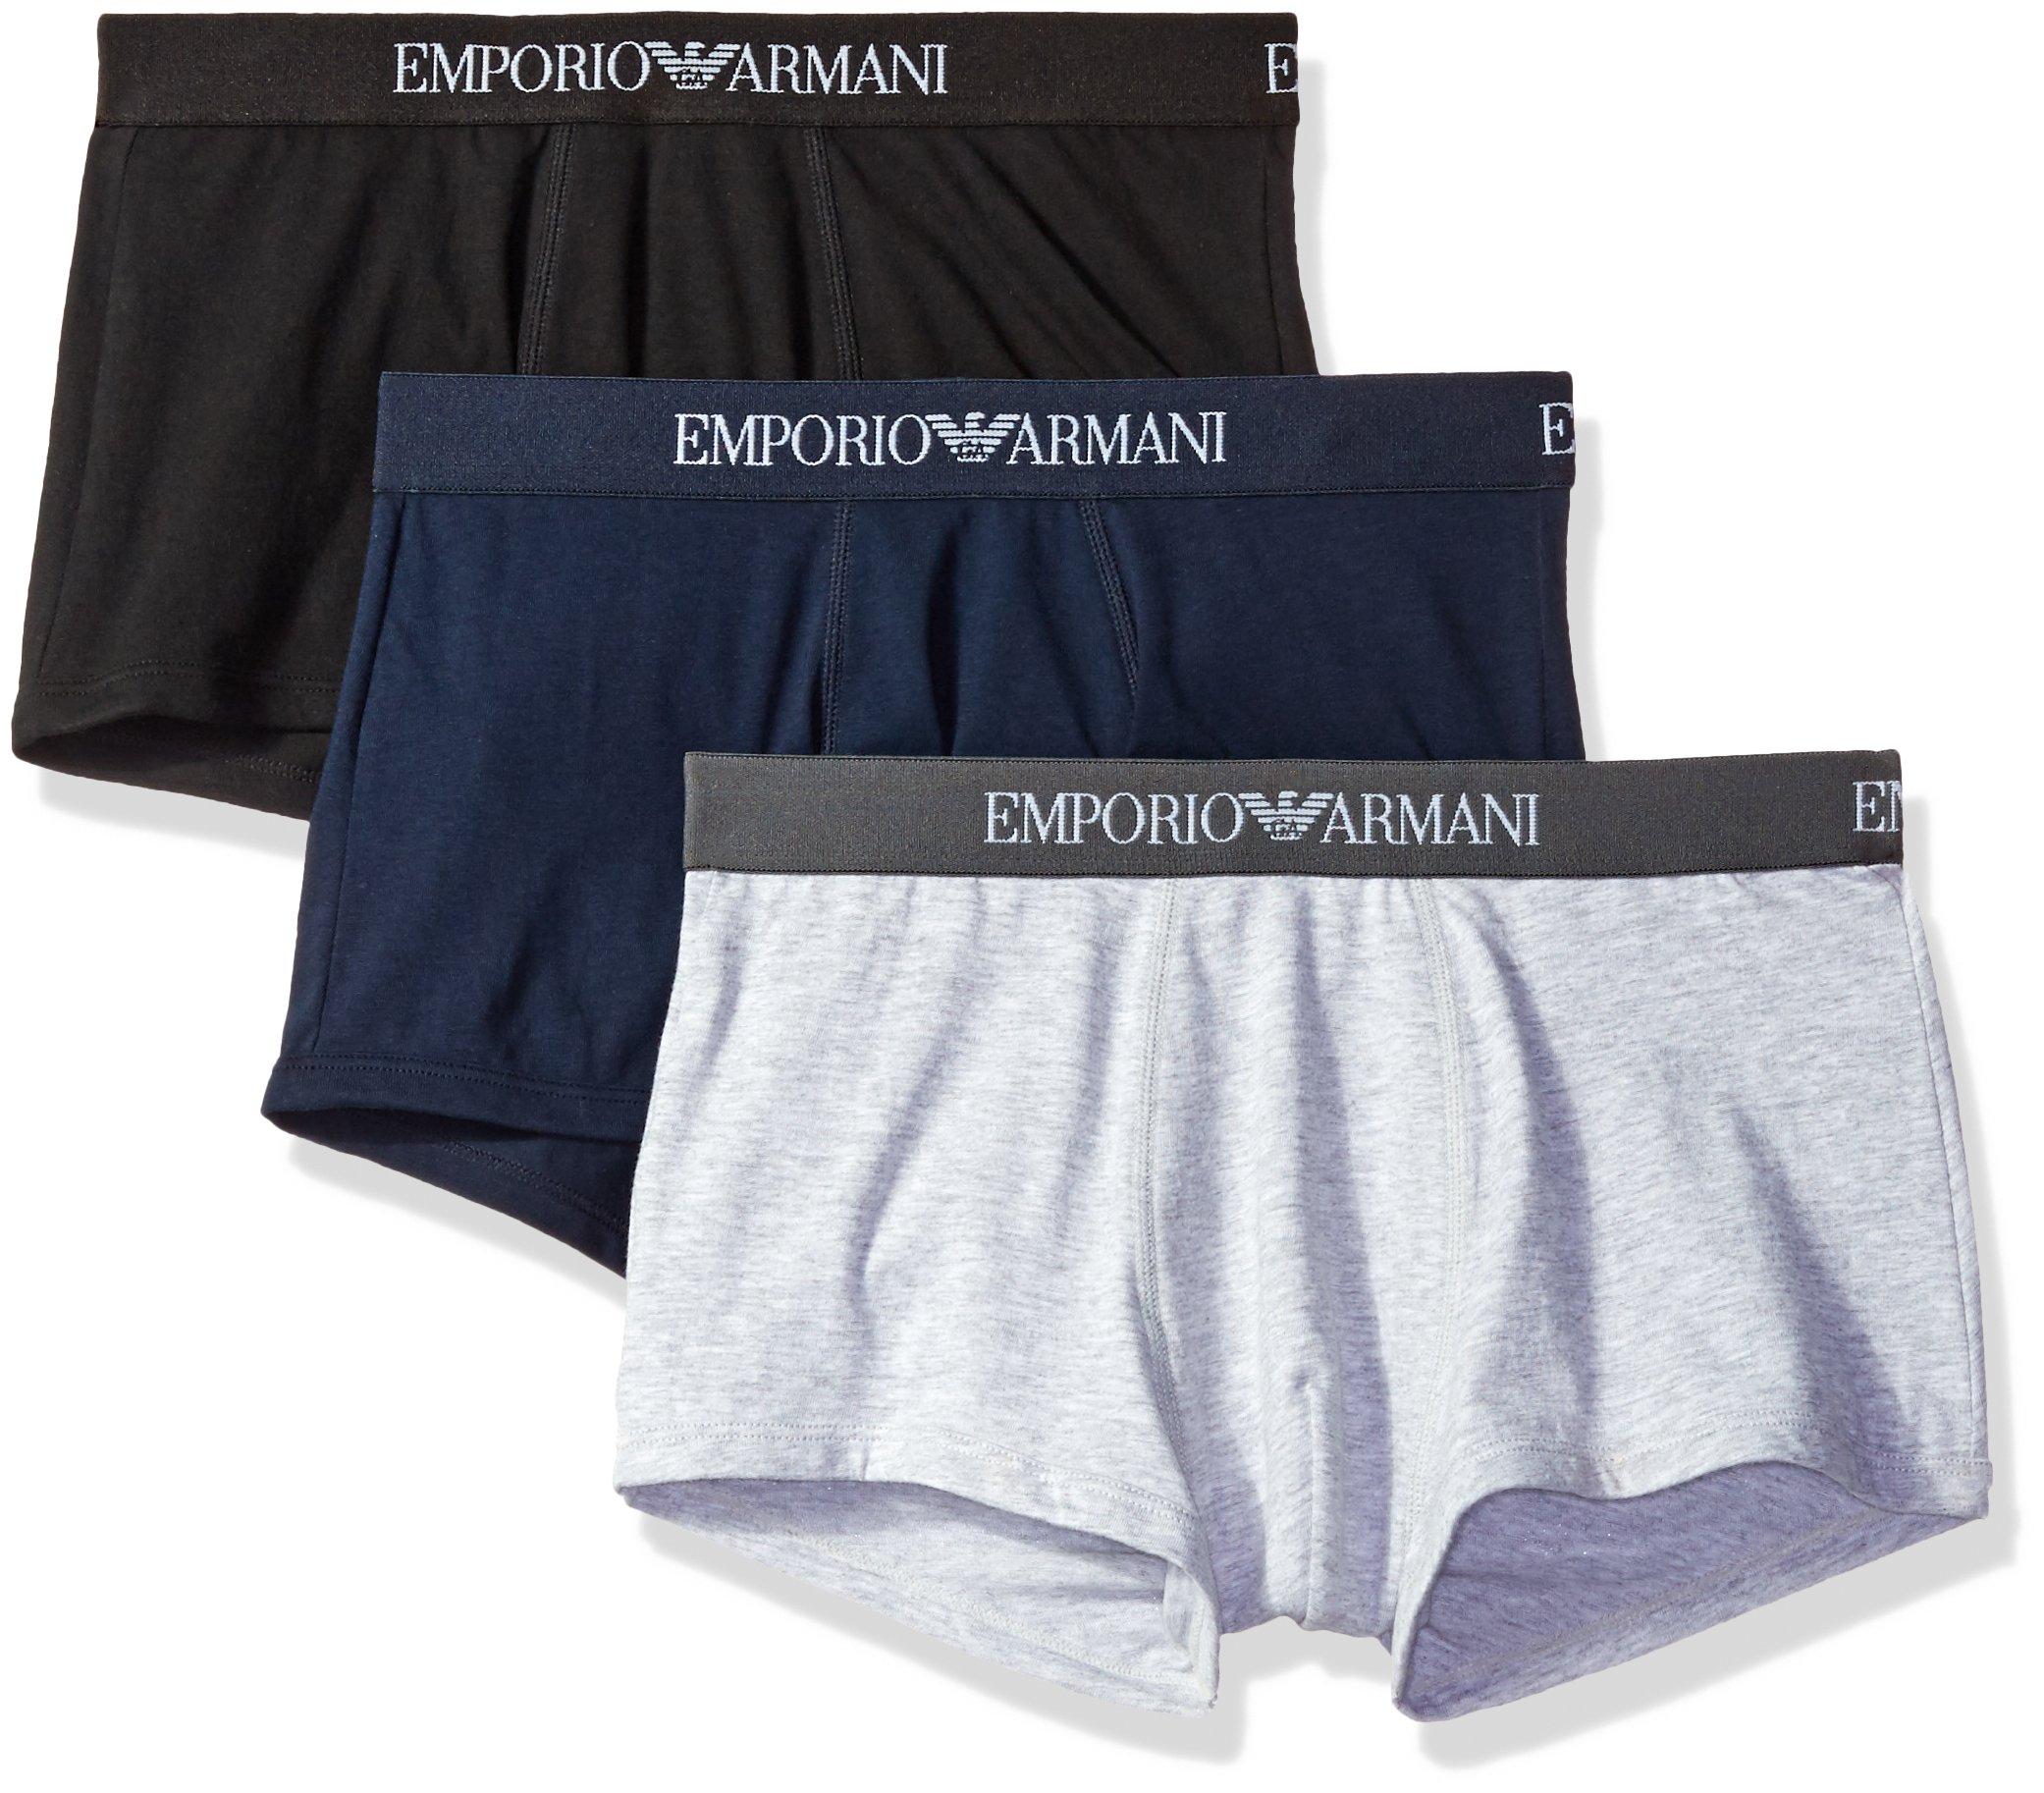 Emporio Armani Men's 3-Pack Cotton Trunks, Grey/Navy/Black, Medium